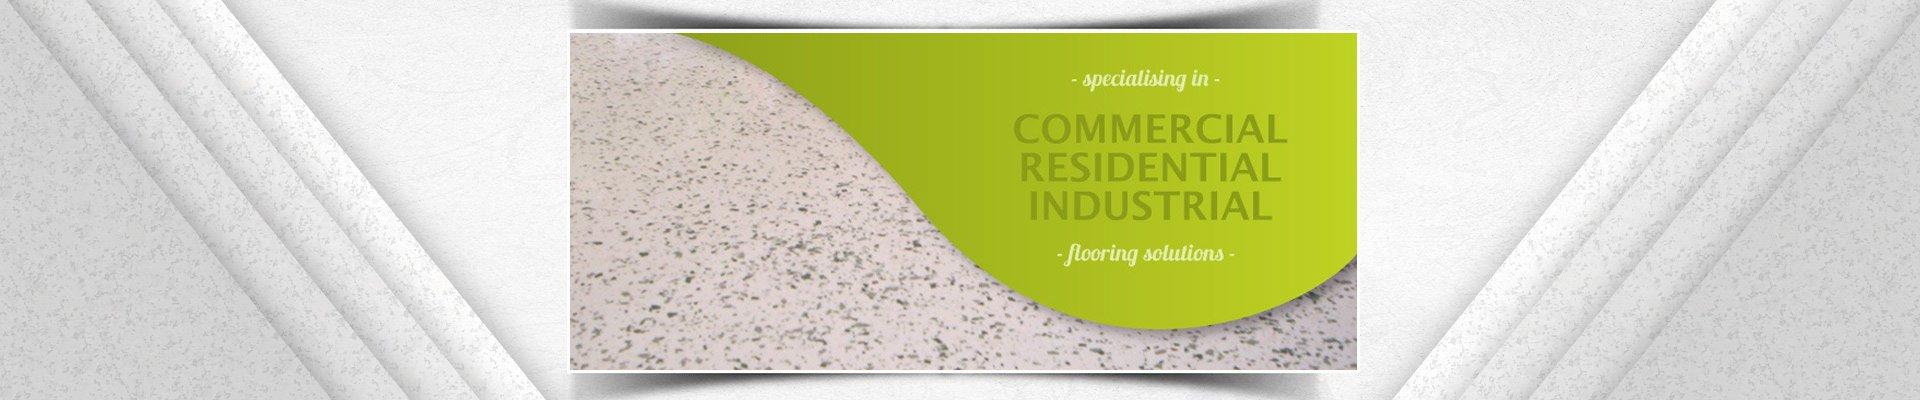 jbl seamless flooring banner advertisment